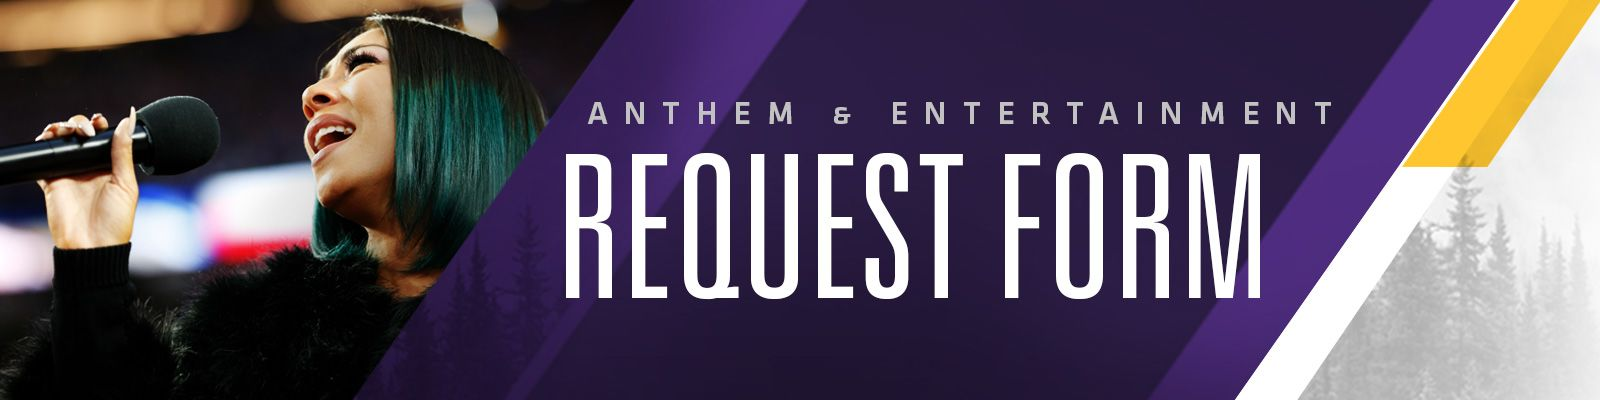 ANTHEM)REQUEST_FORM_1600x400_v1_current